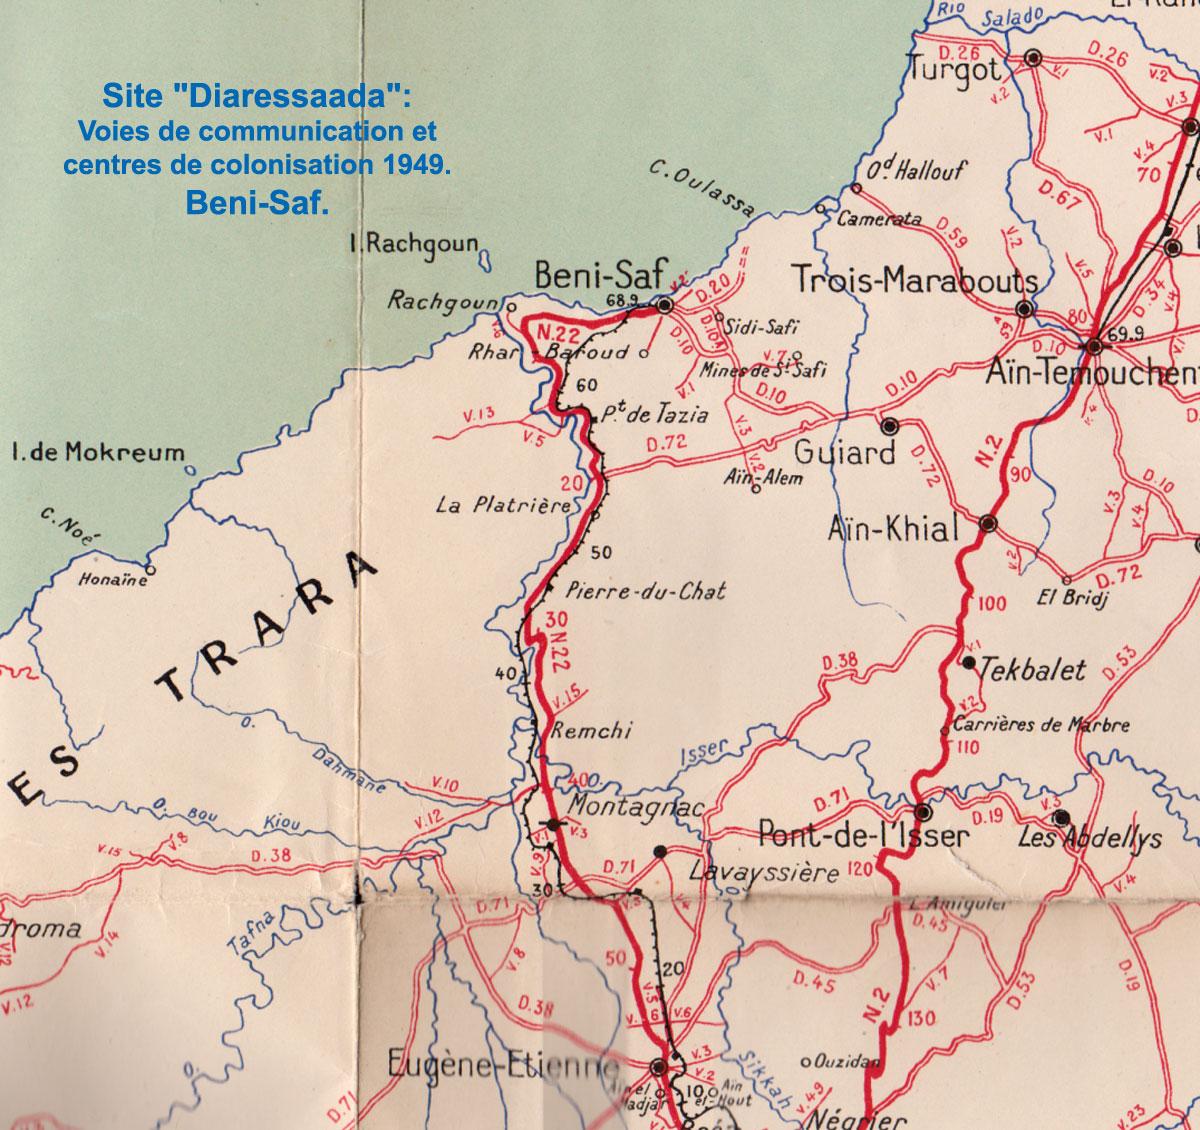 Carte Algerie Beni Saf.Population Des Departements De L Oranie Oran Mostaganem